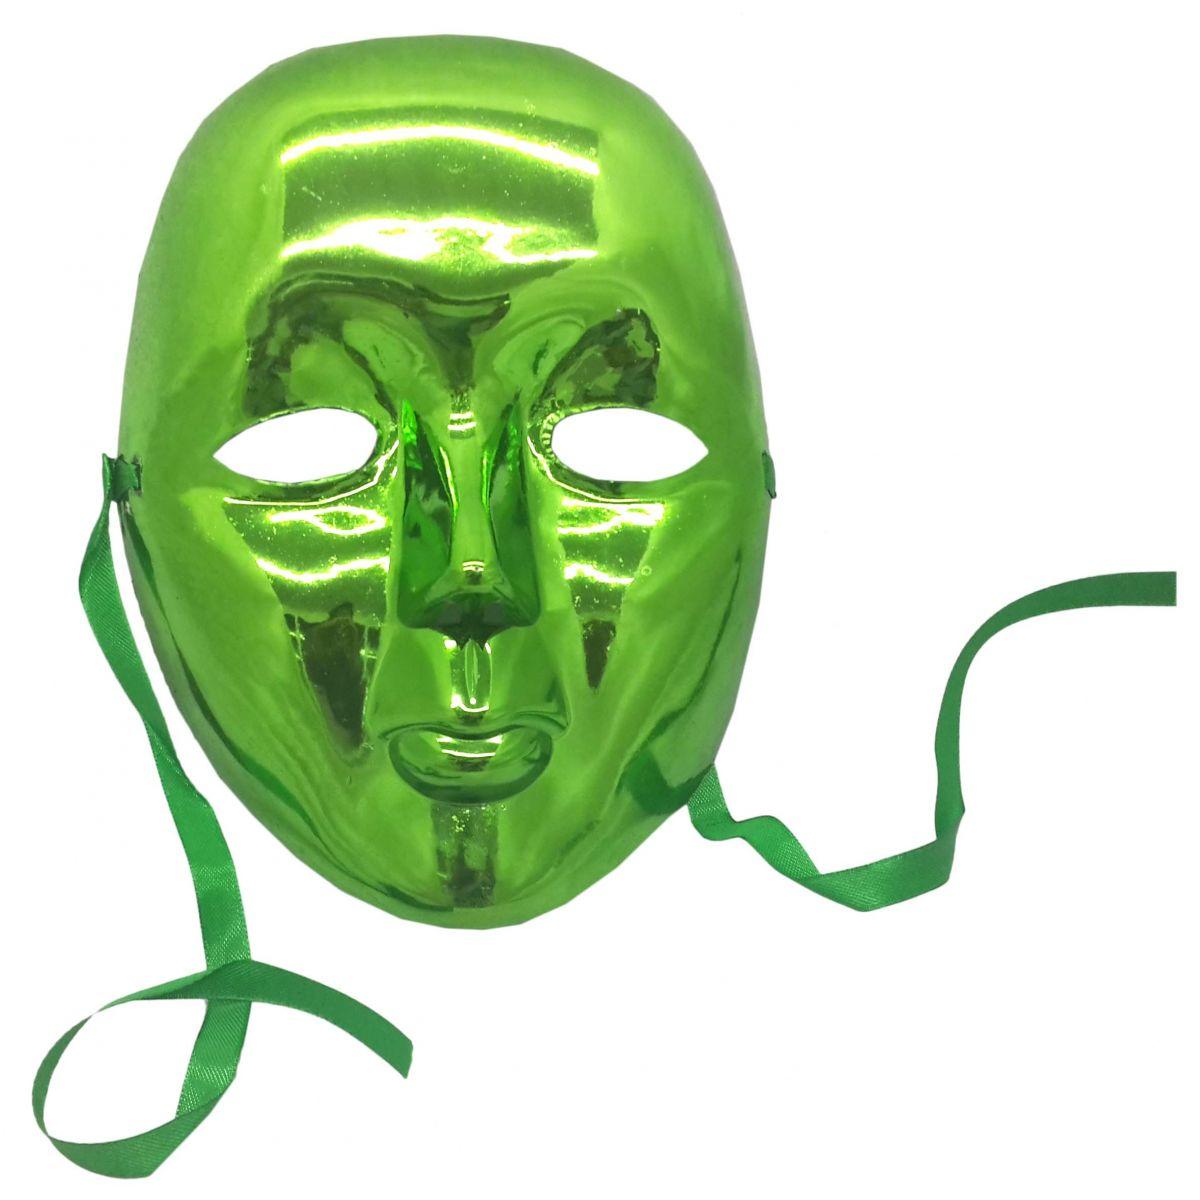 ... Conjunto 2 Mascaras Para Festa Baile Carnaval Halloween Fantasia  Metalizada Verde e Dourada (BL- ... ad17fa7f170